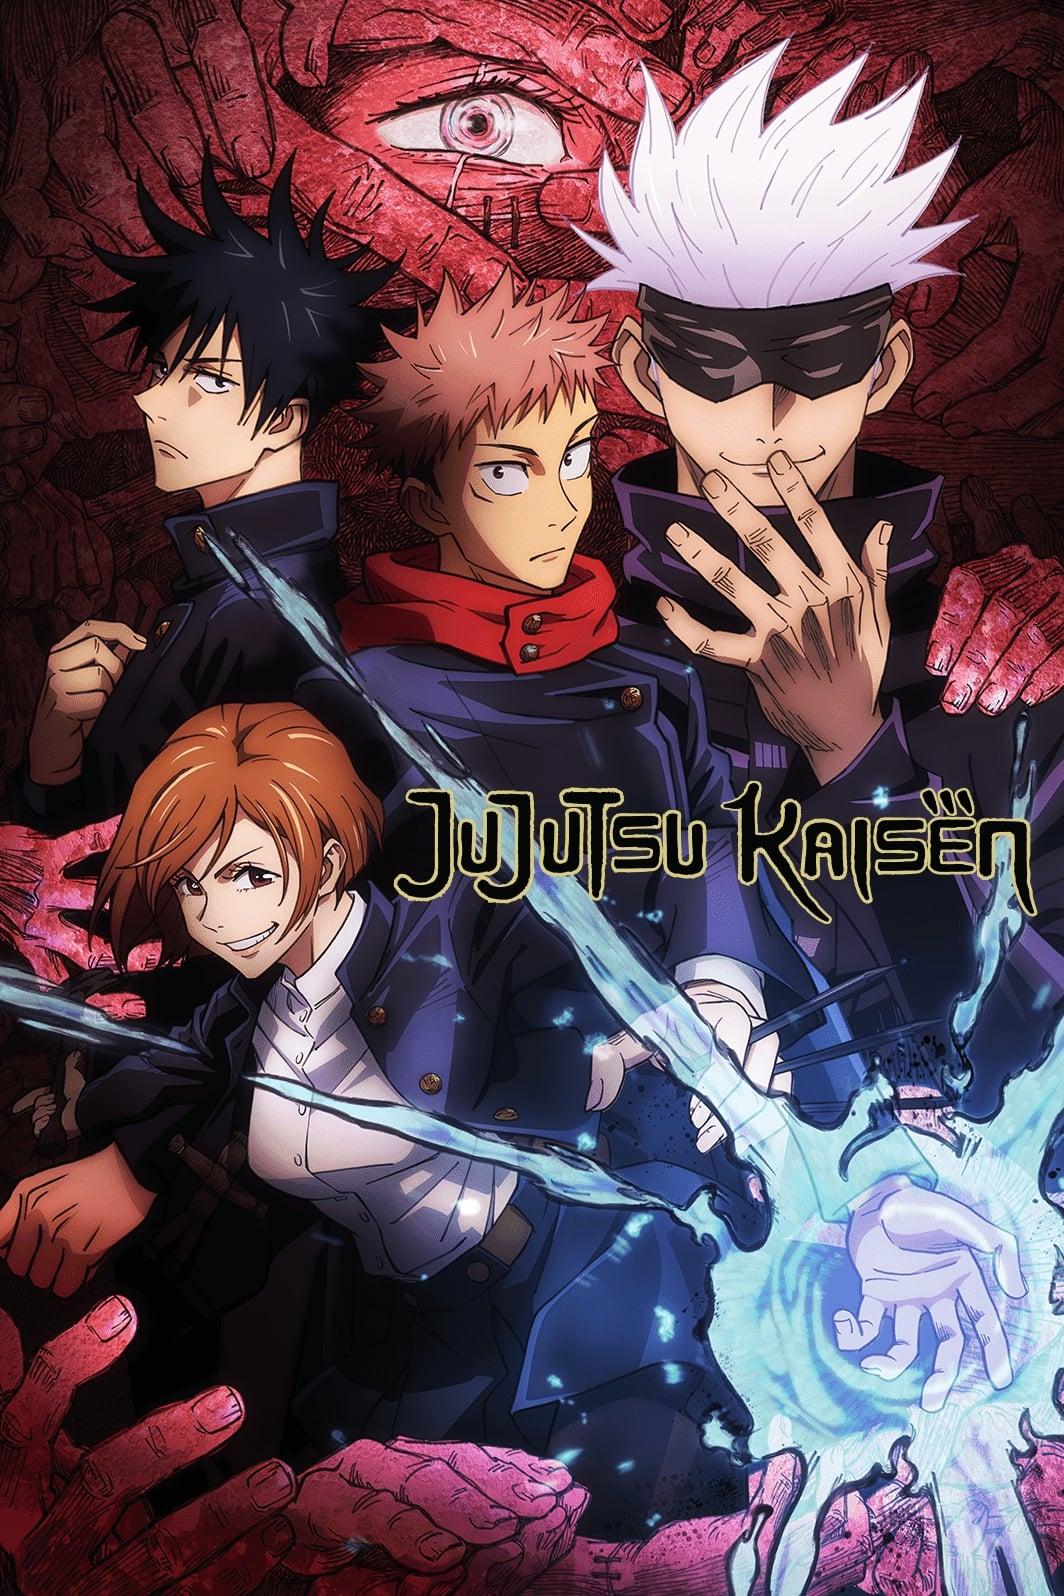 Jujutsu Kaisen (TV) Poster